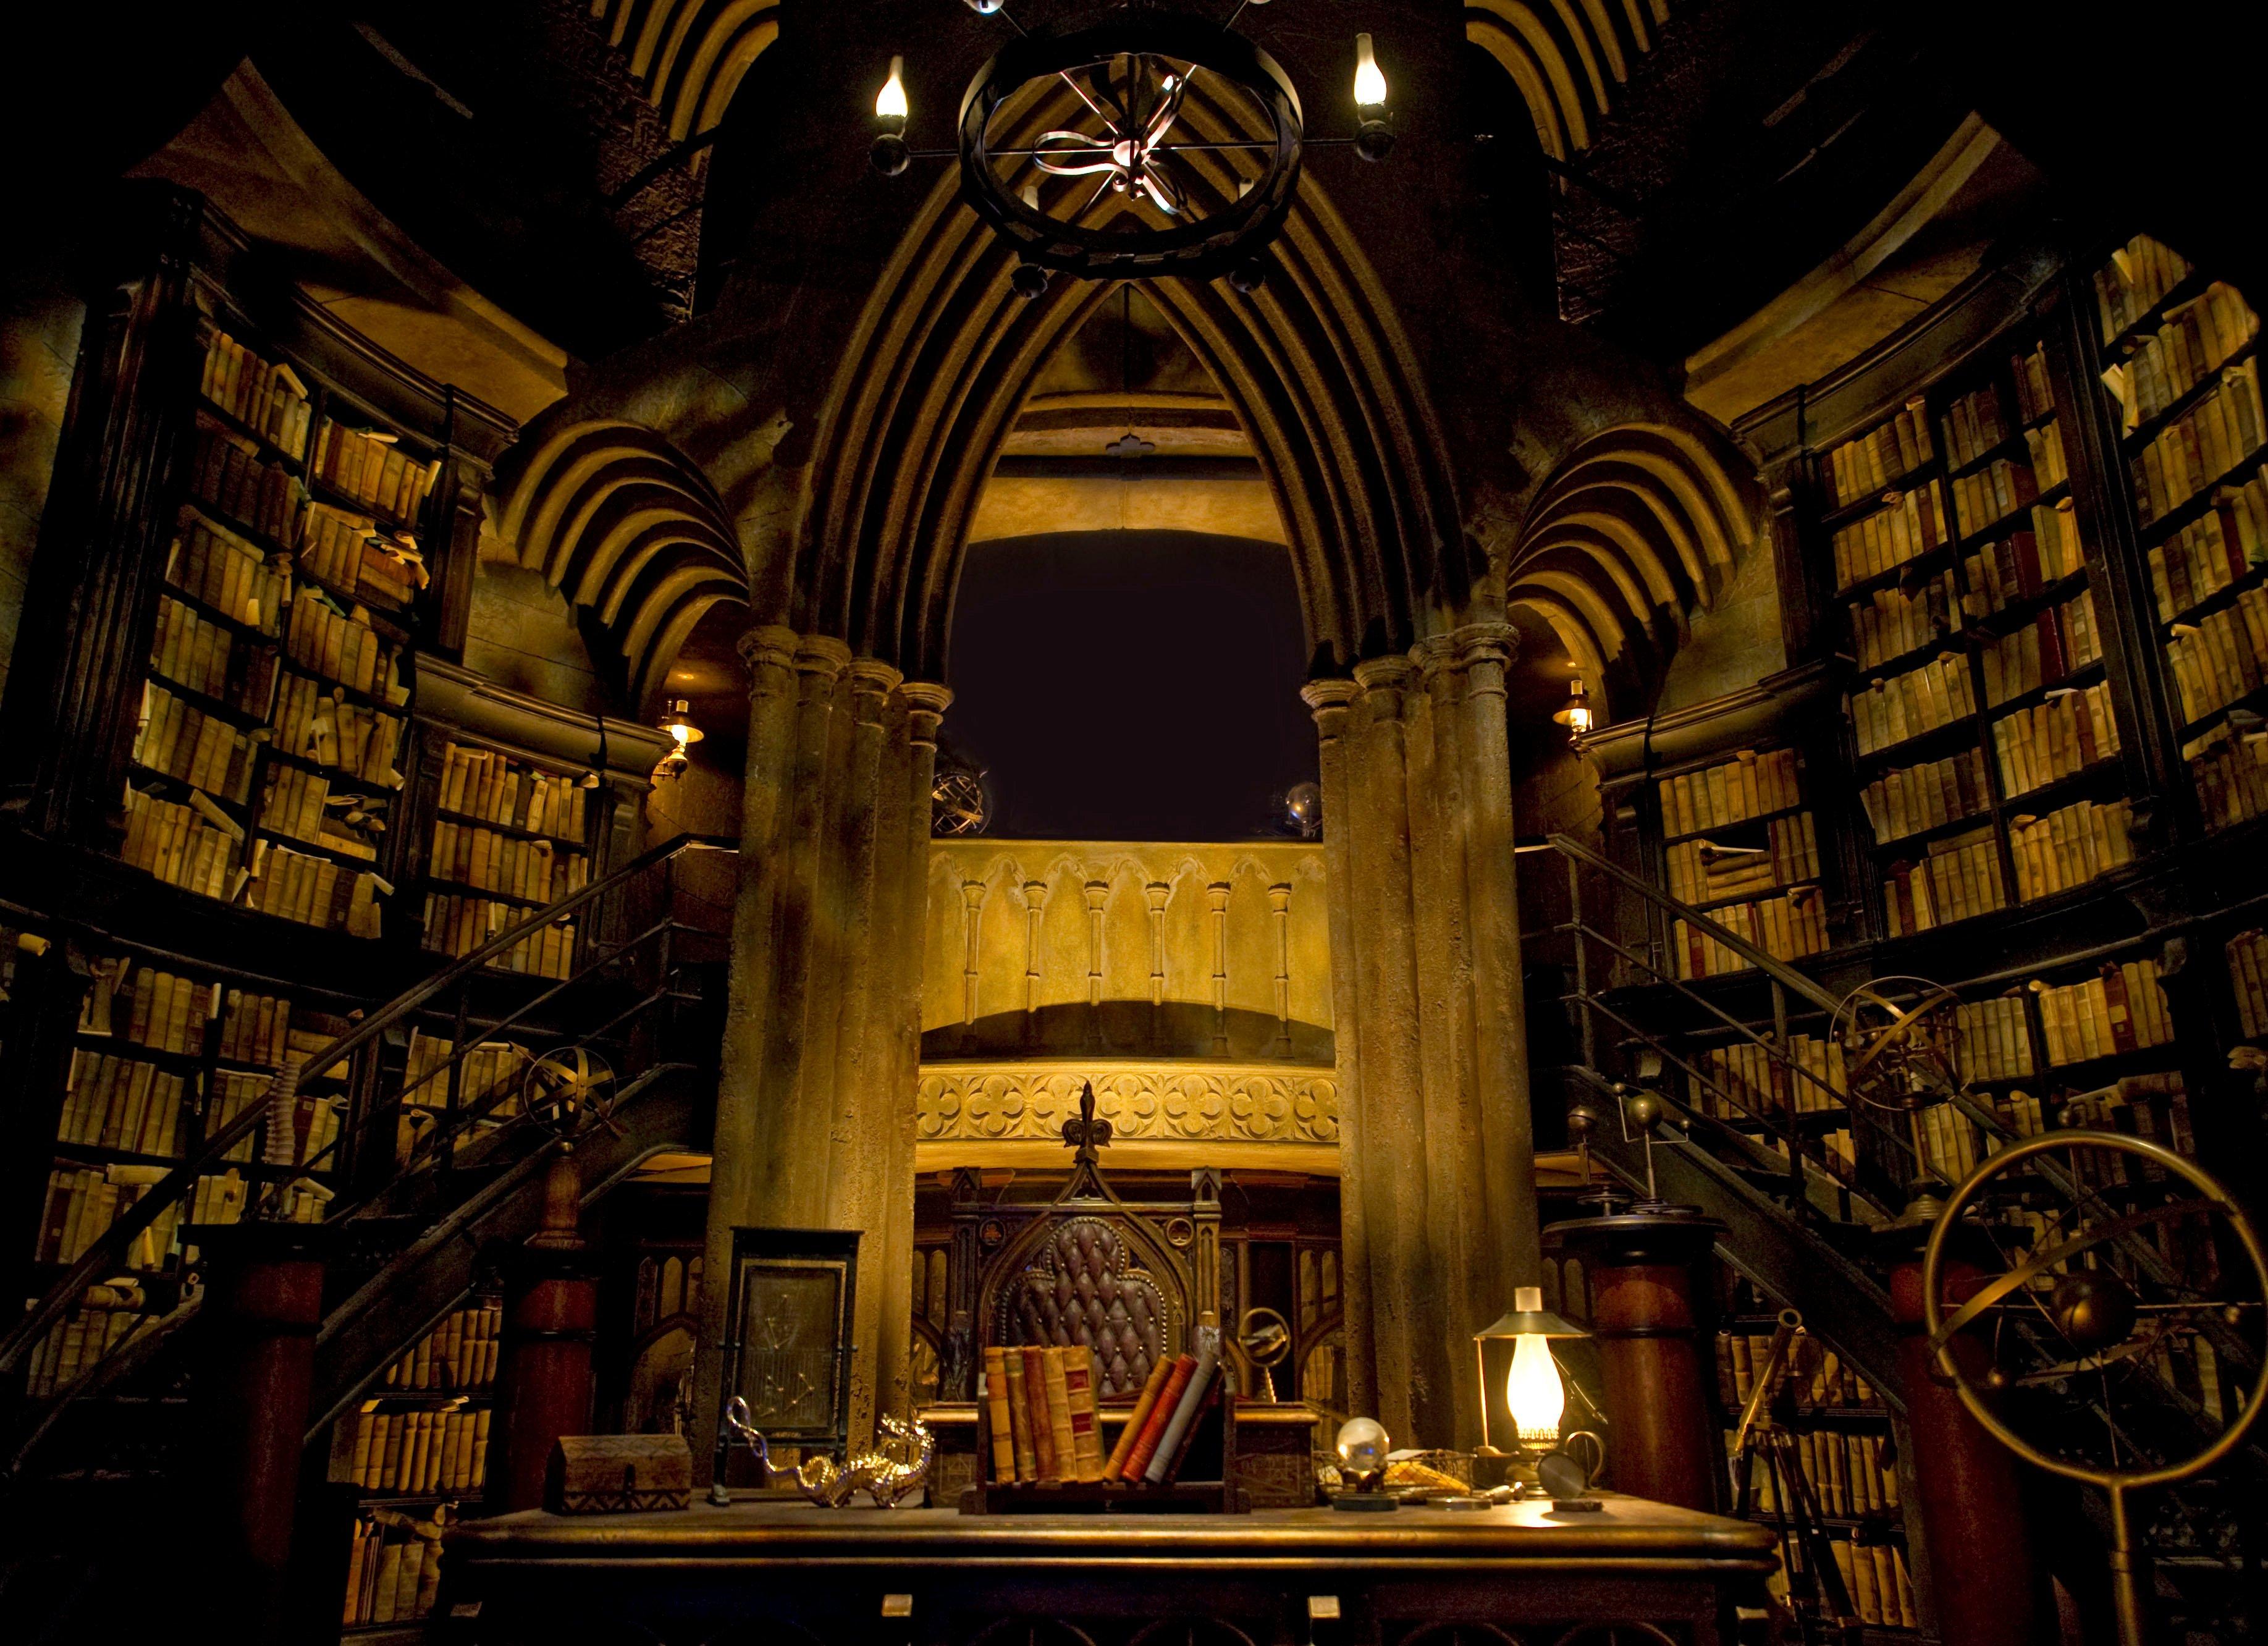 Hogwarts wallpaper hd wallpapersafari - Gryffindor crest high resolution ...